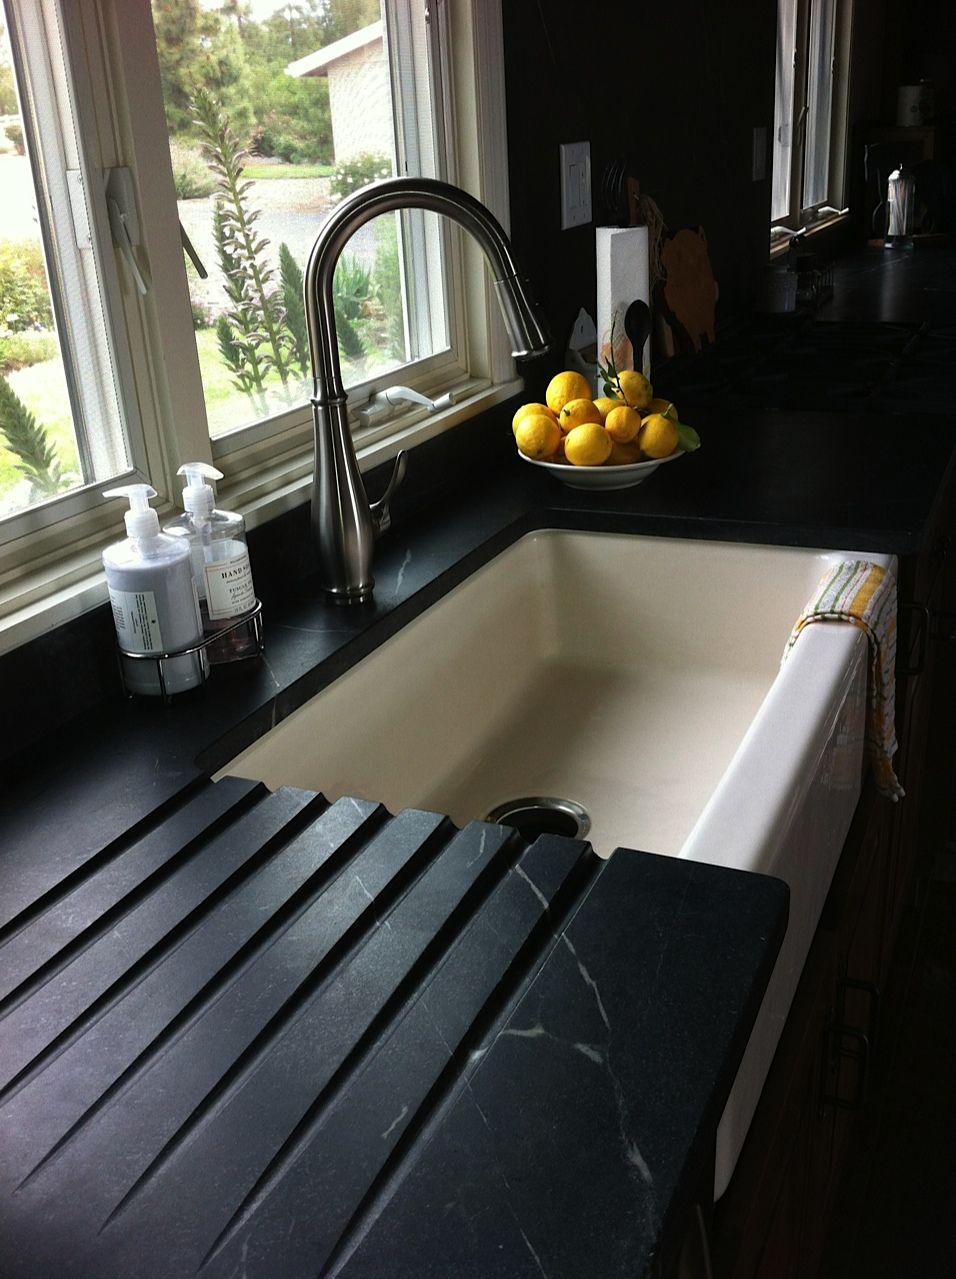 Soapstone Countertops Drainboards Www Soapstonewerks San Go Ca